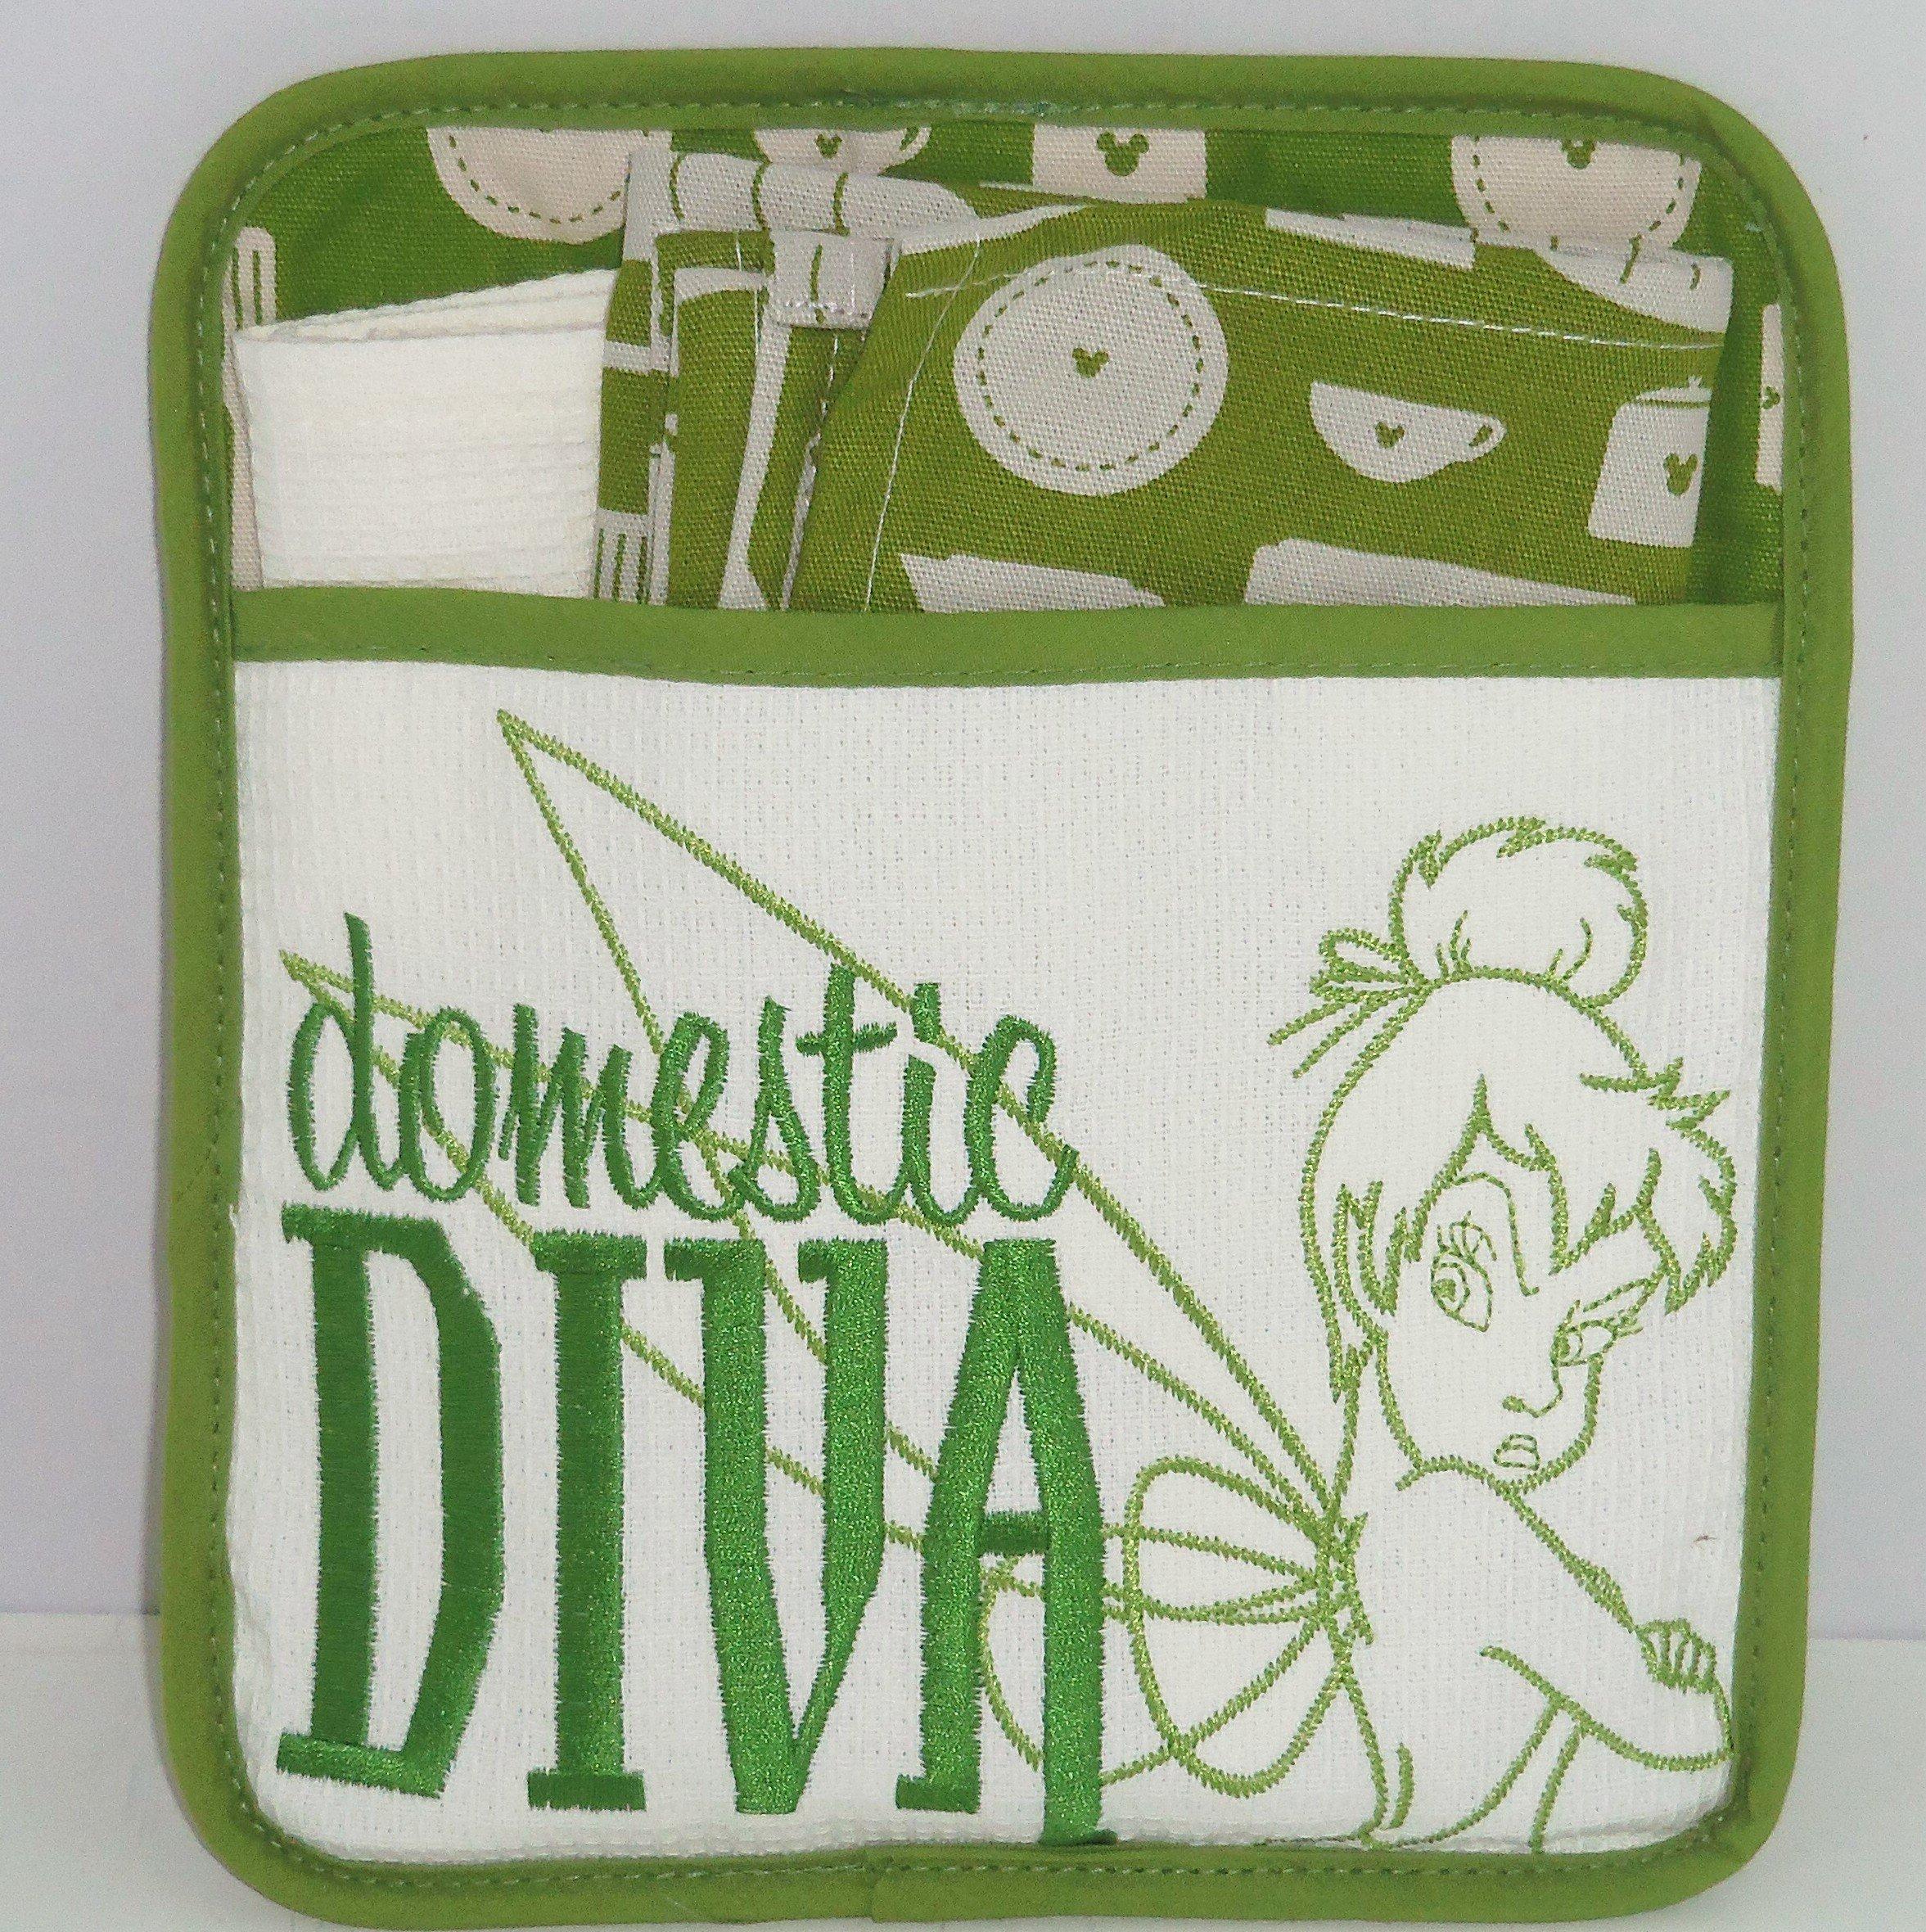 Disney Tinker Bell Domestic Diva Potholder Dish Towel Cloth Theme Parks by Disney